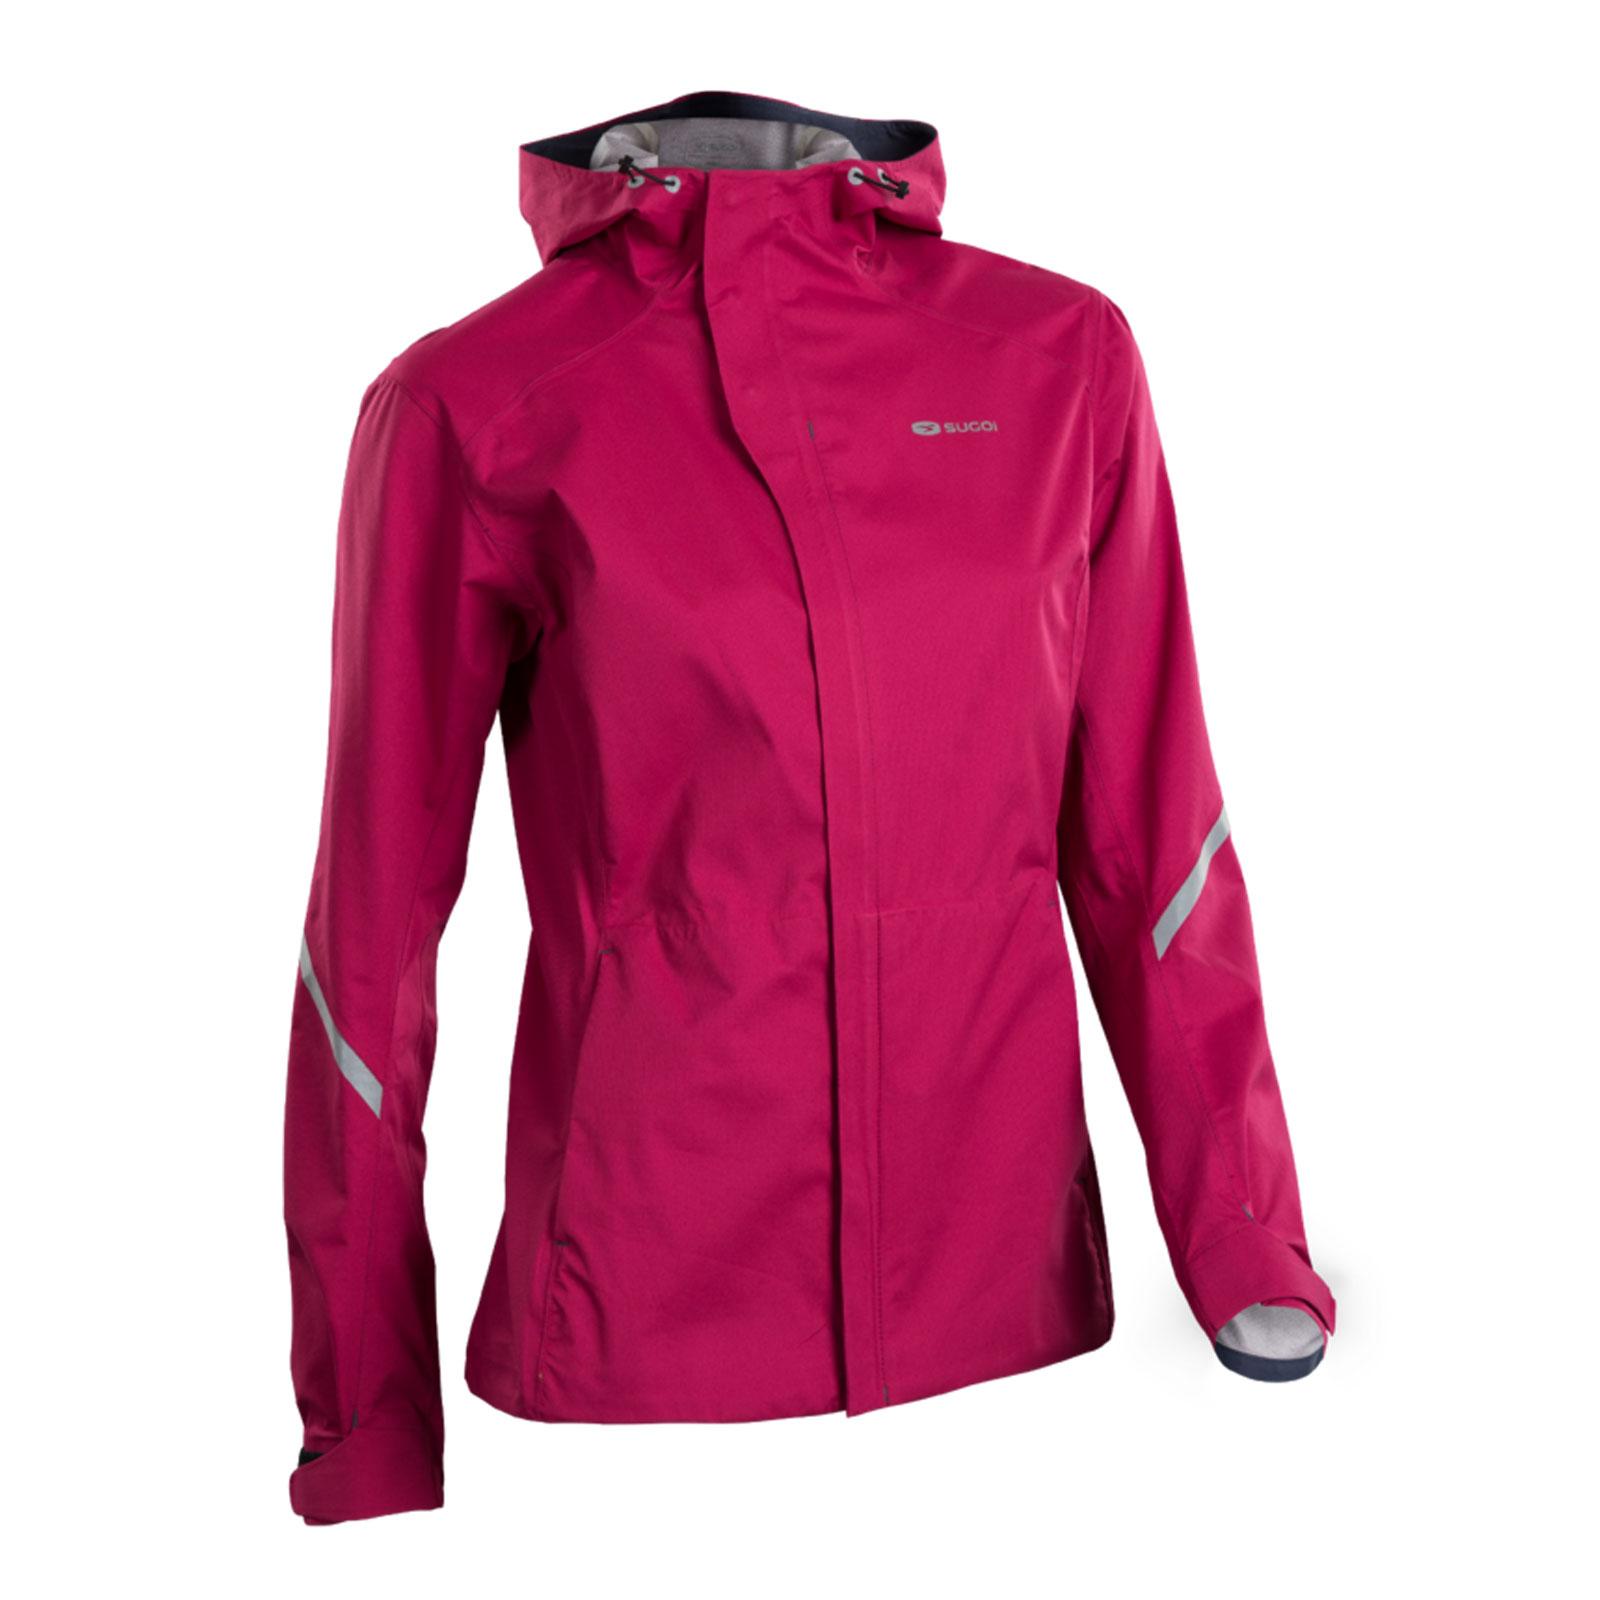 SUGOI Metro Waterproof Running Jacket With Hood Womens Purple M ...